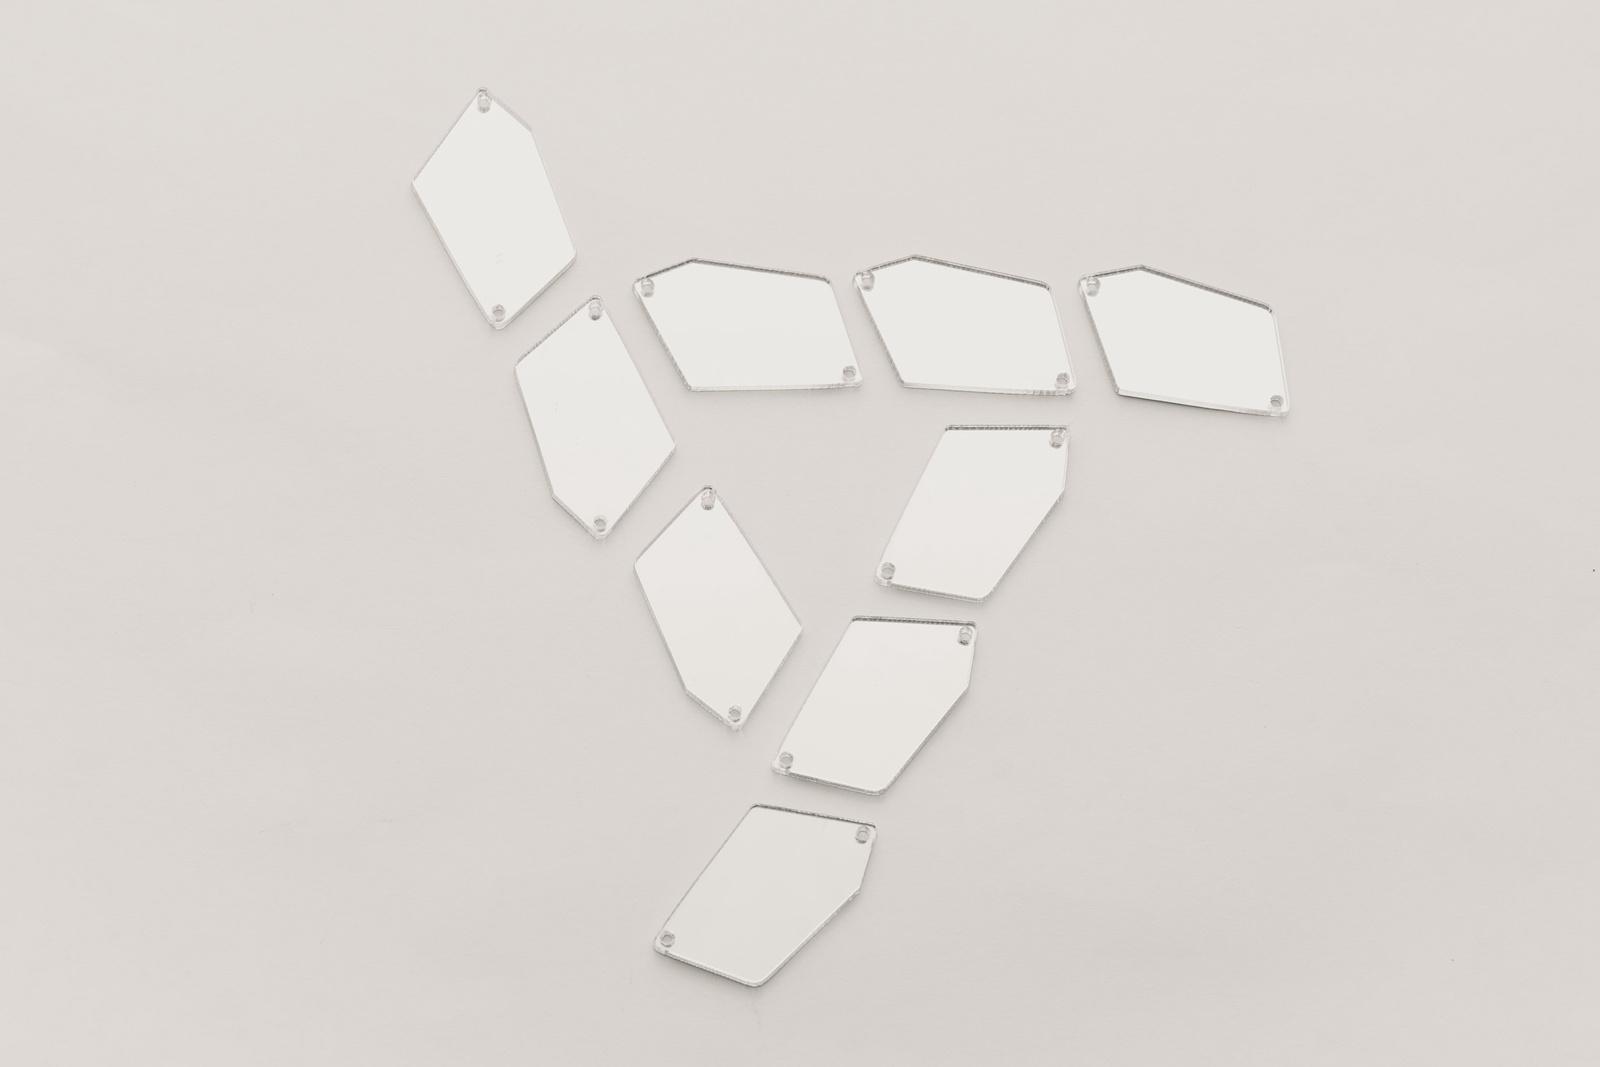 Стразы CASP Lase Пятиугольник 31х20